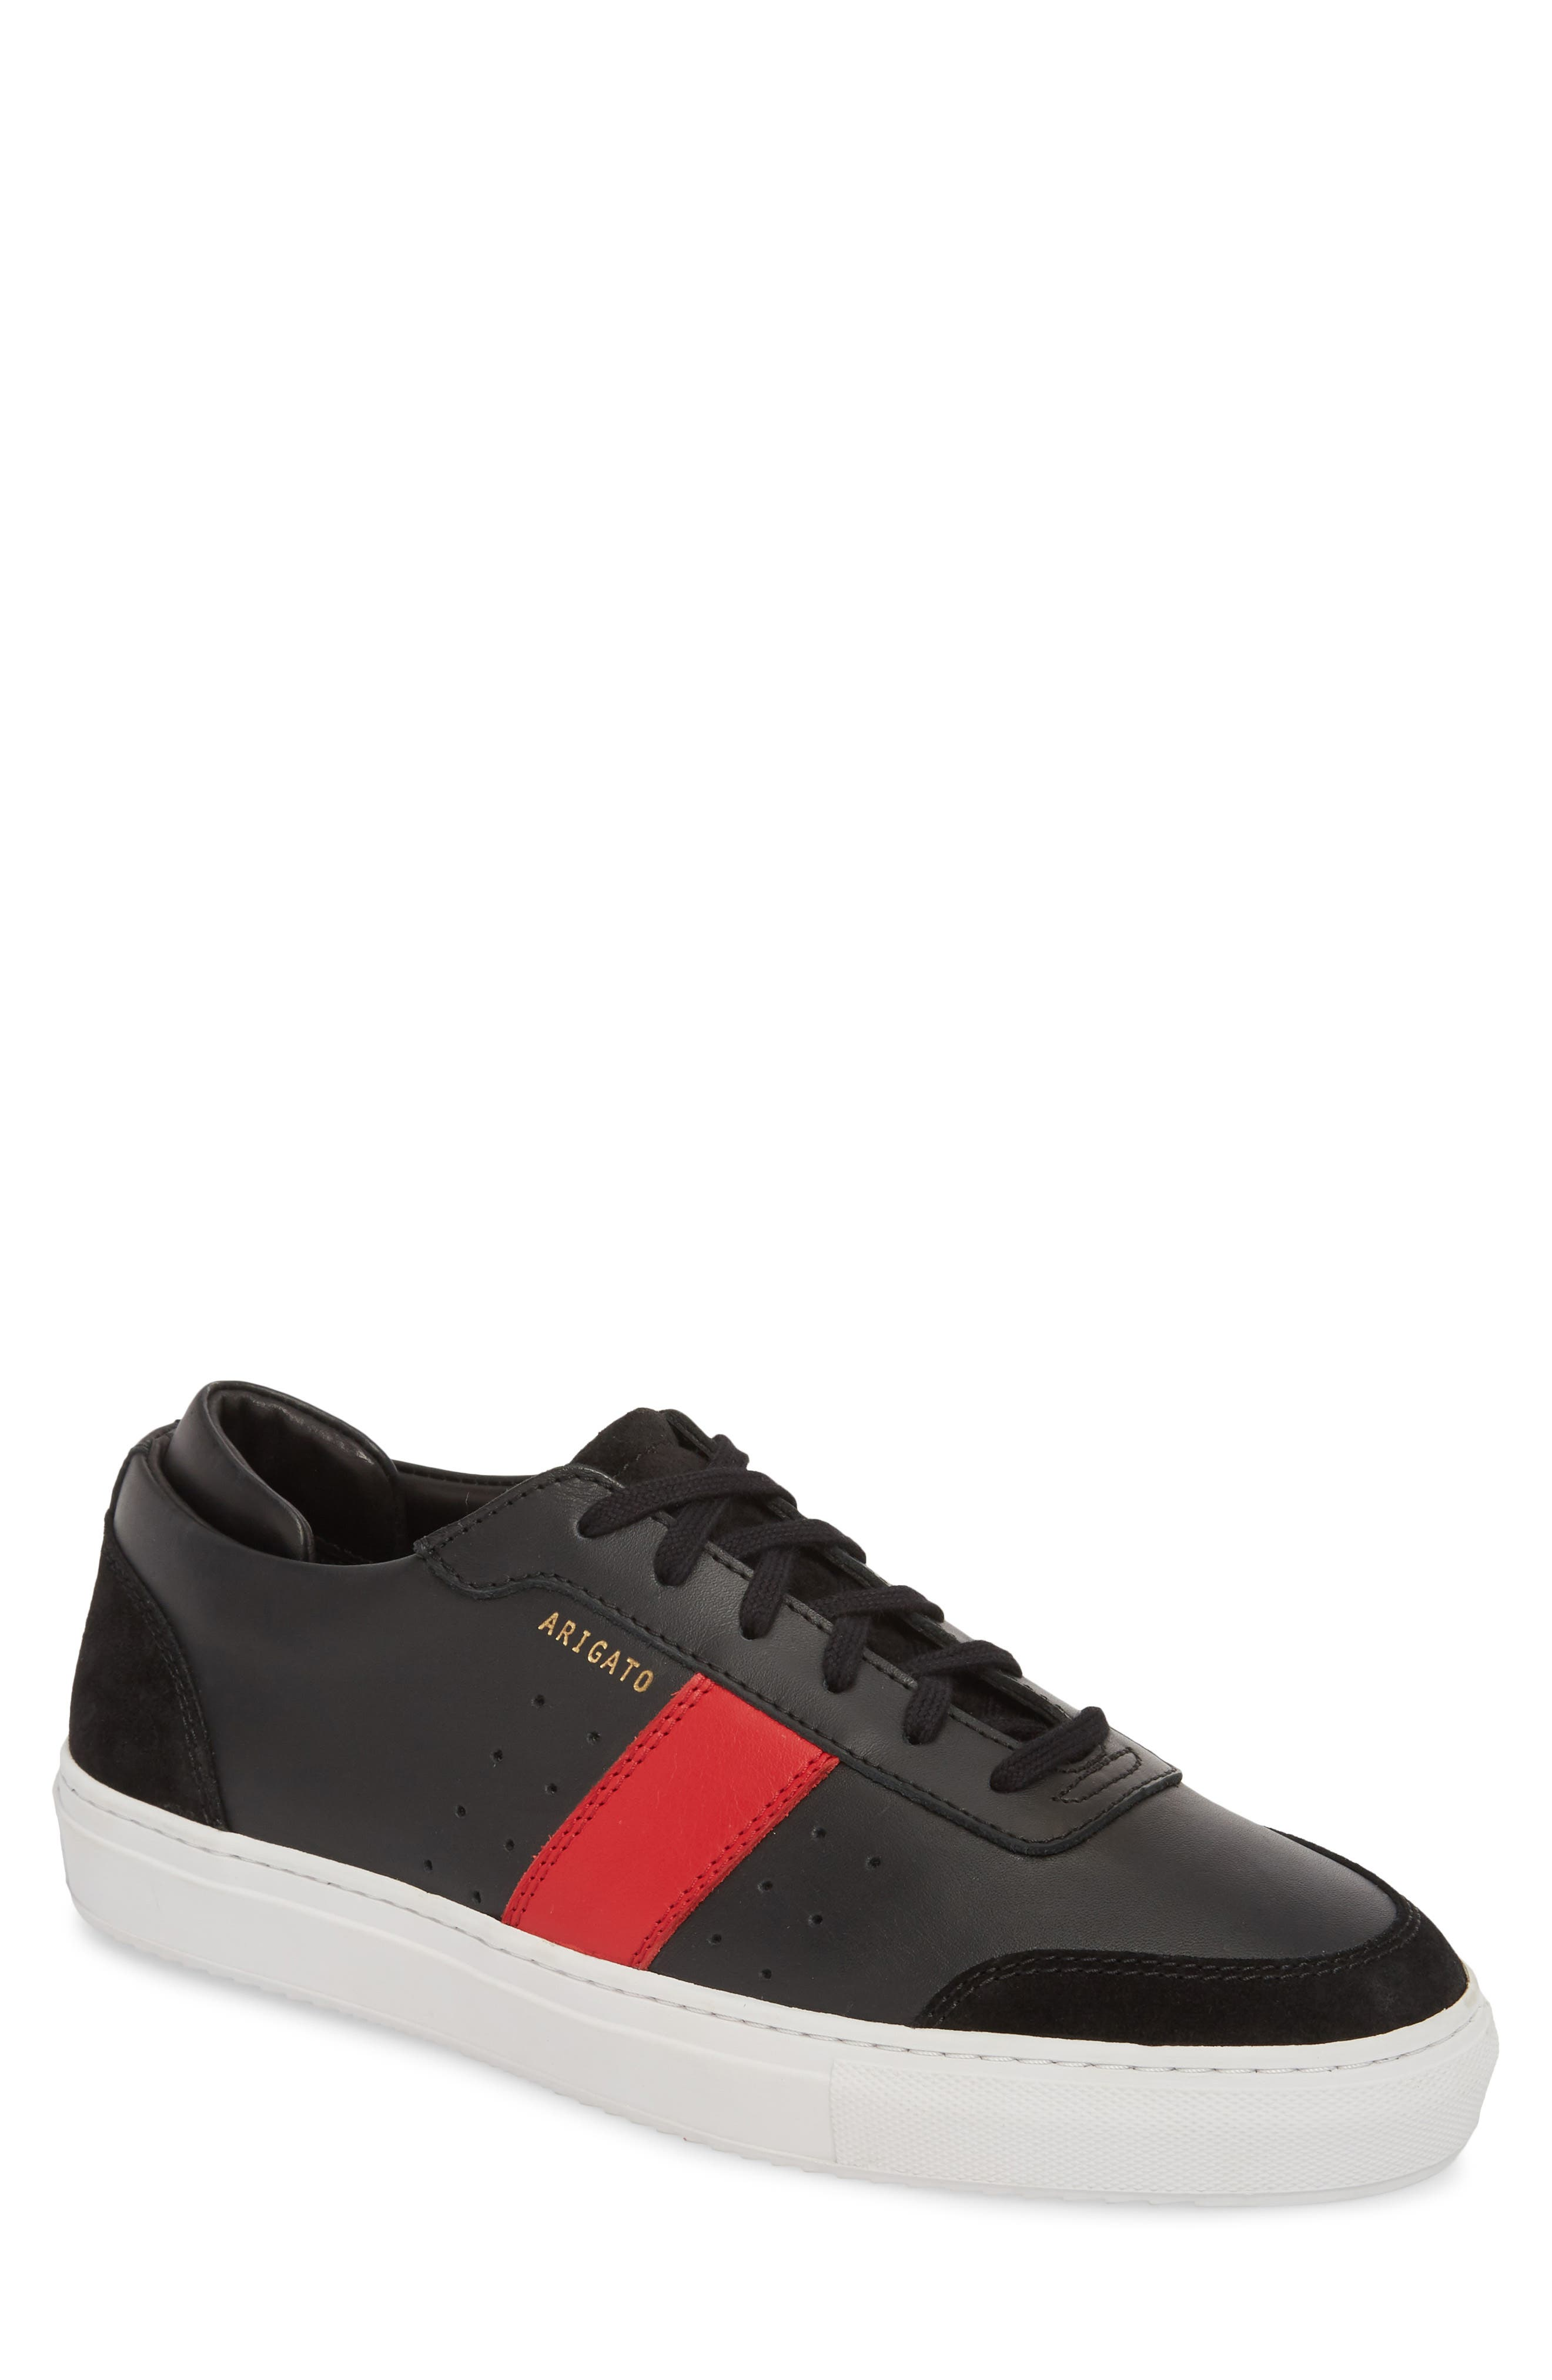 Dunk Sneaker,                         Main,                         color, BLACK/ BLACK